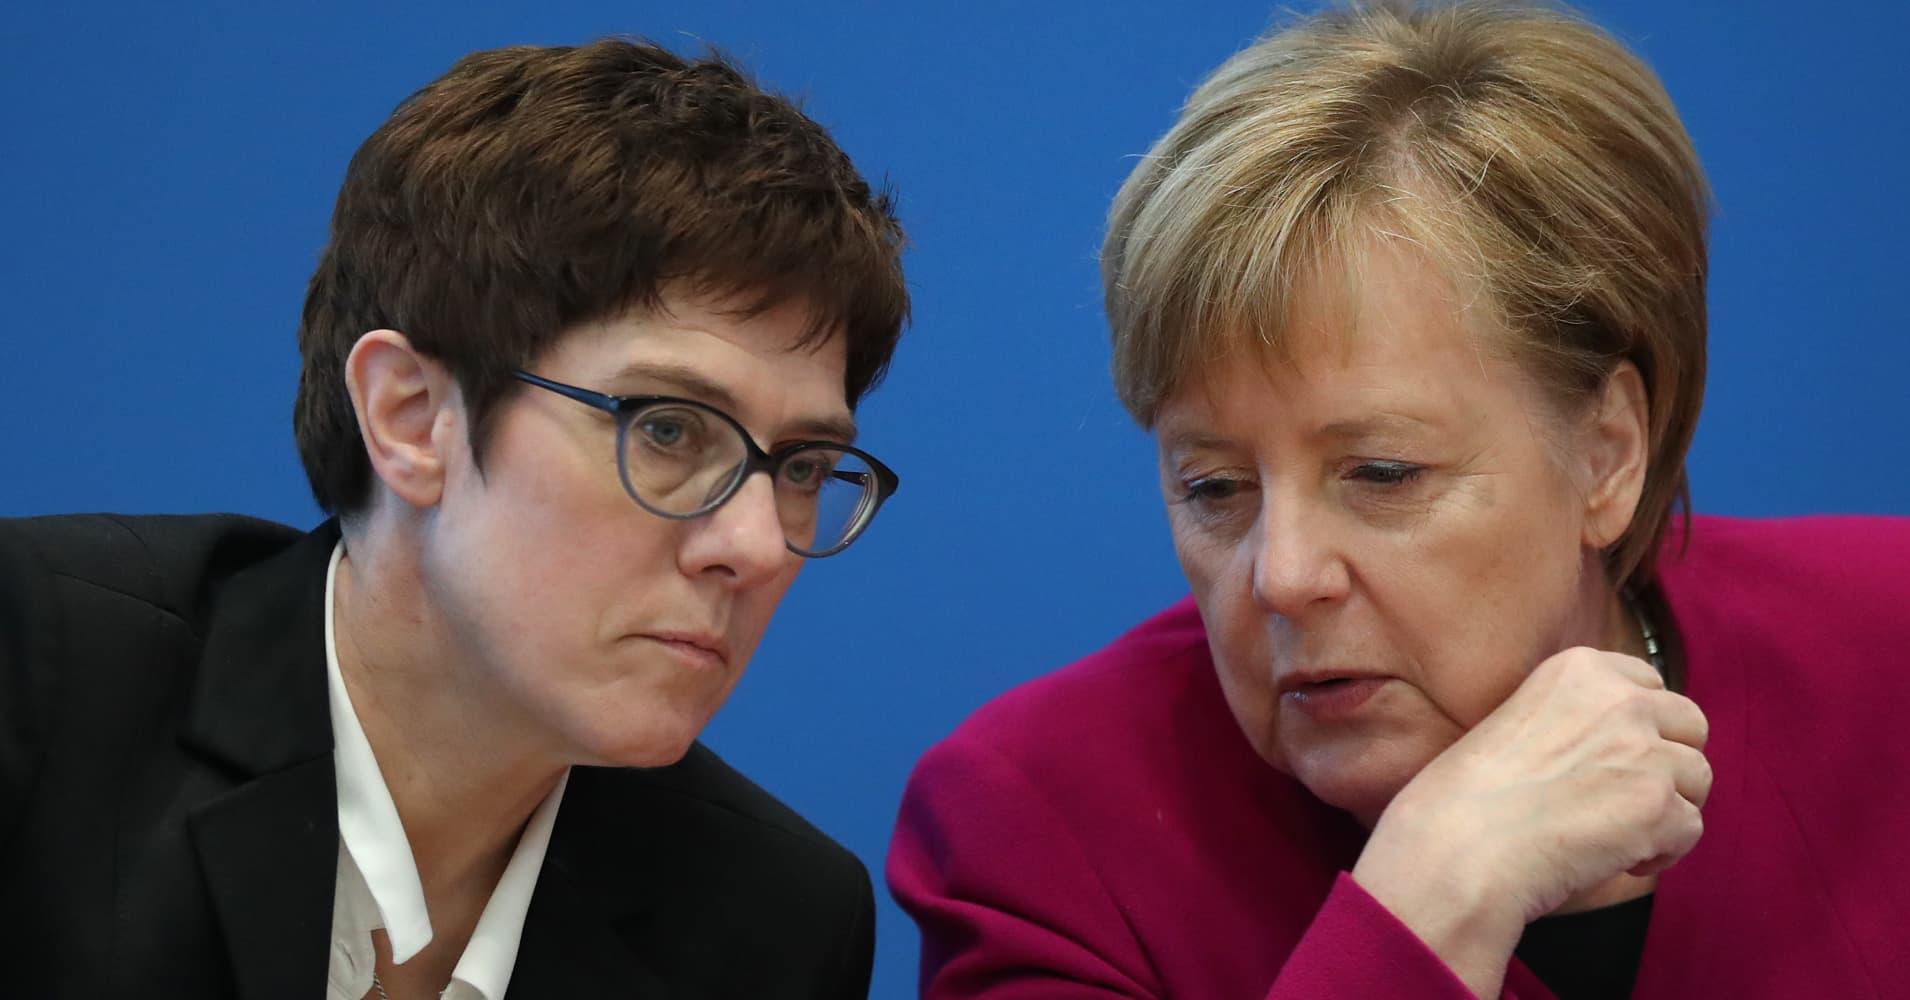 Germany avoids political winds of change after 'mini-Merkel' win